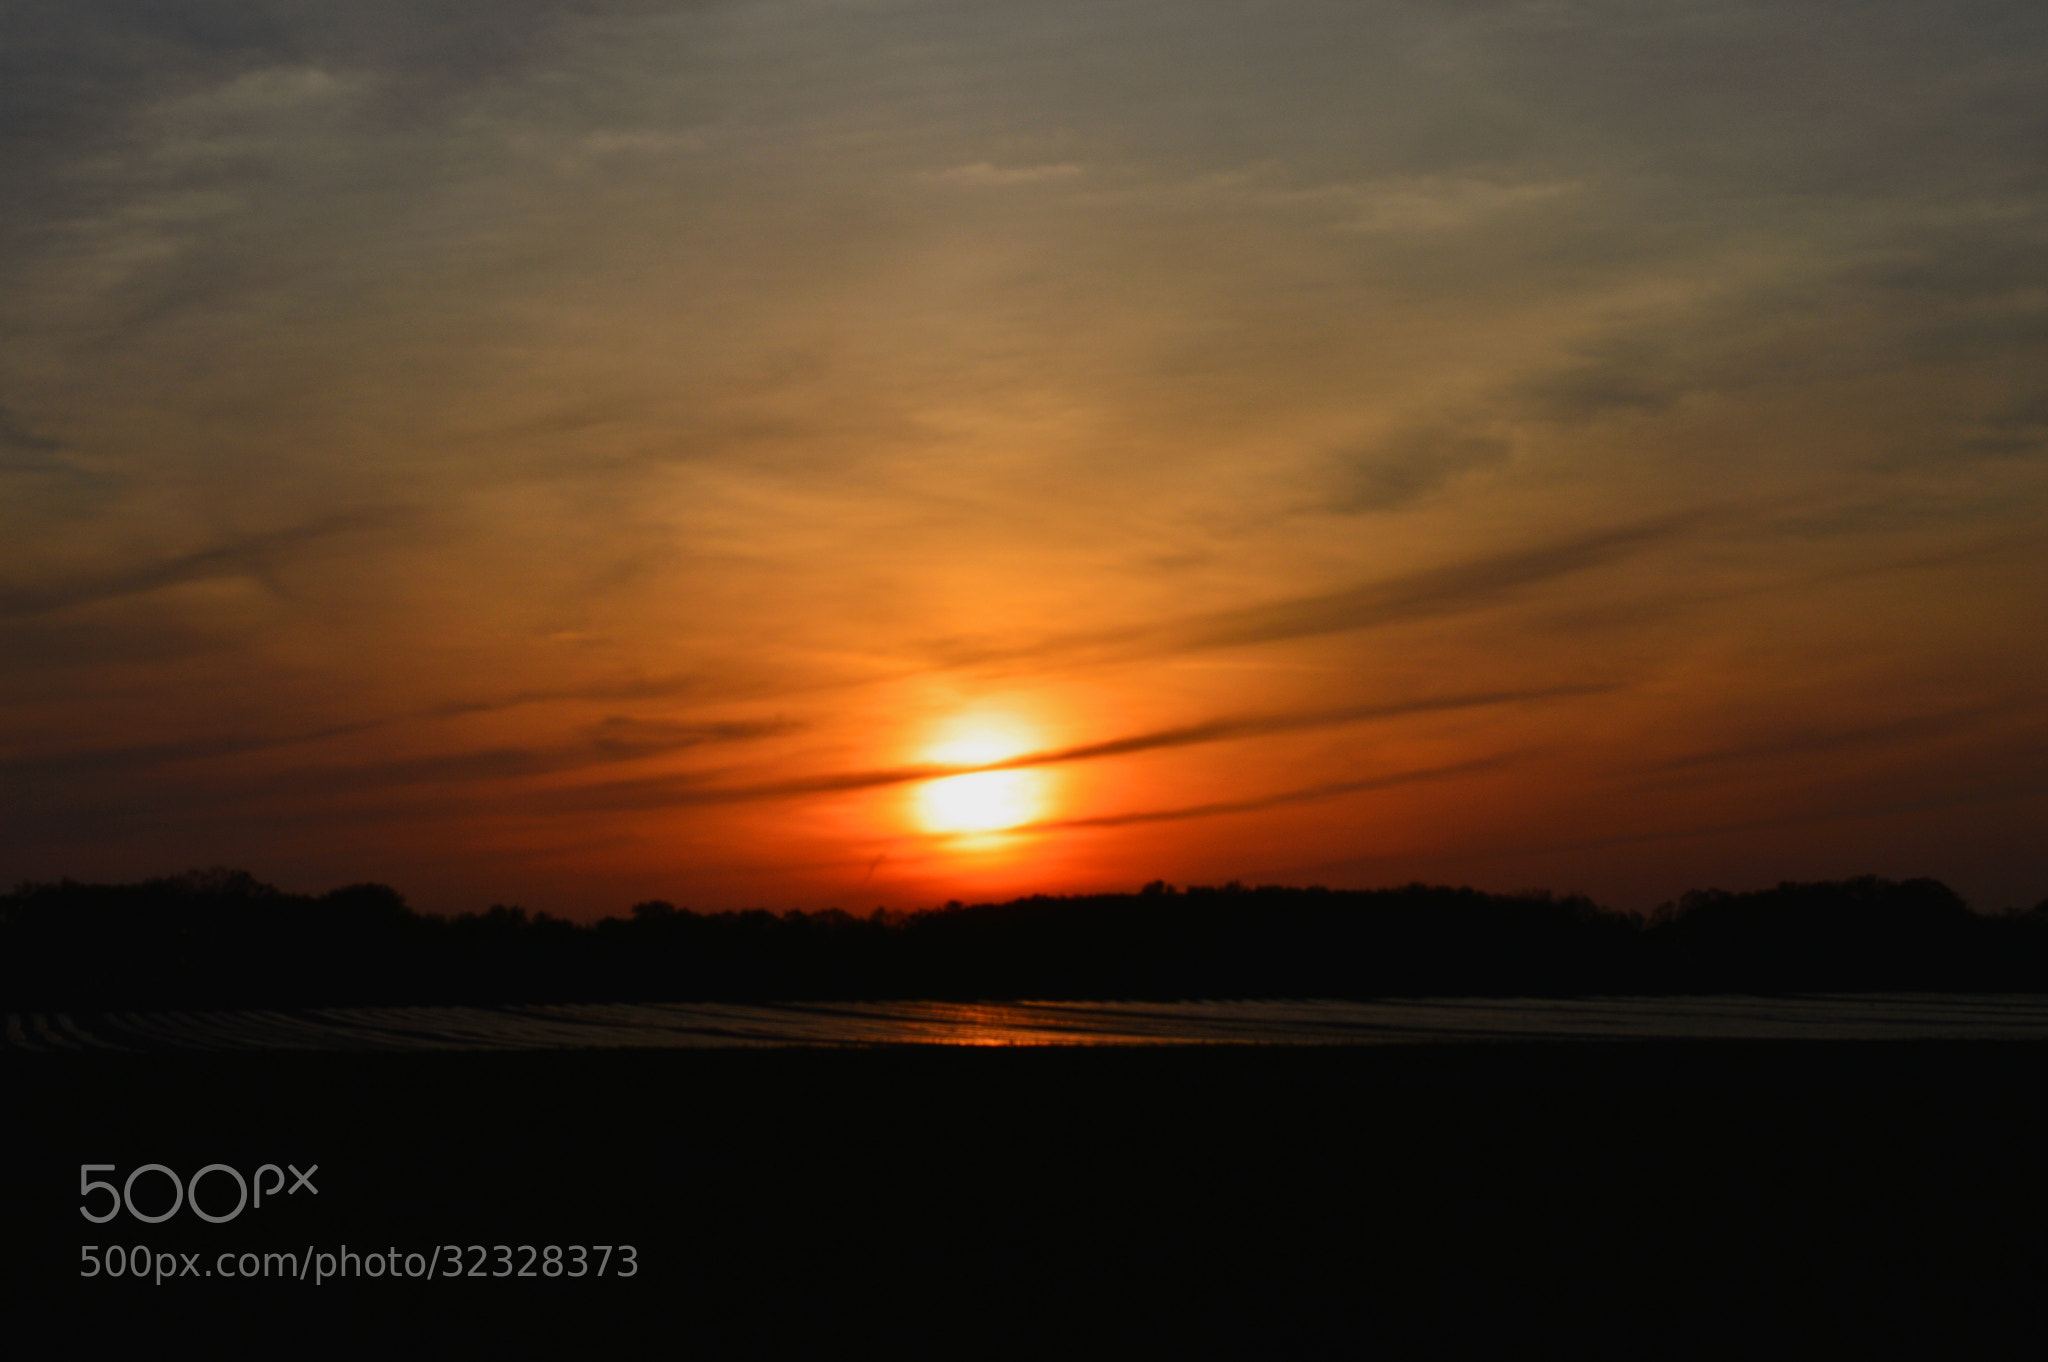 Photograph sunset by Ryan Baptiste on 500px